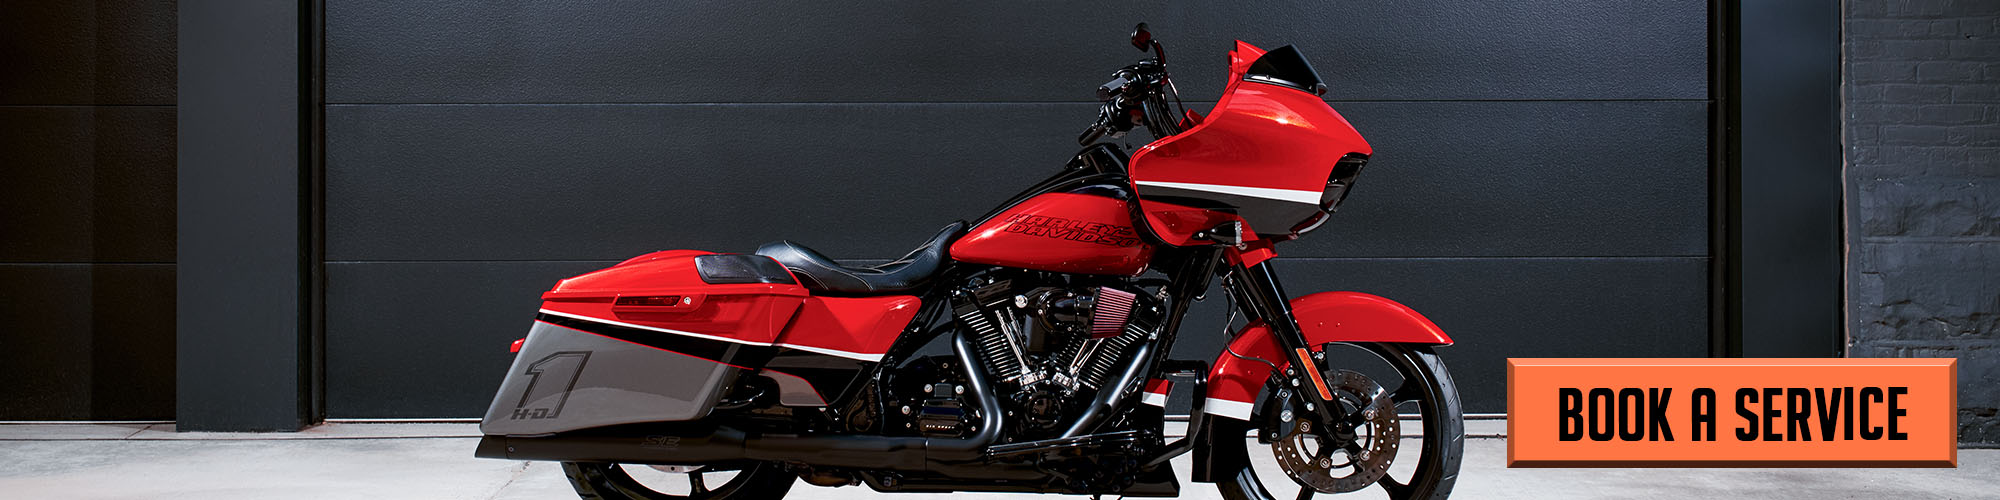 Book A Service at M & S Harley-Davidson